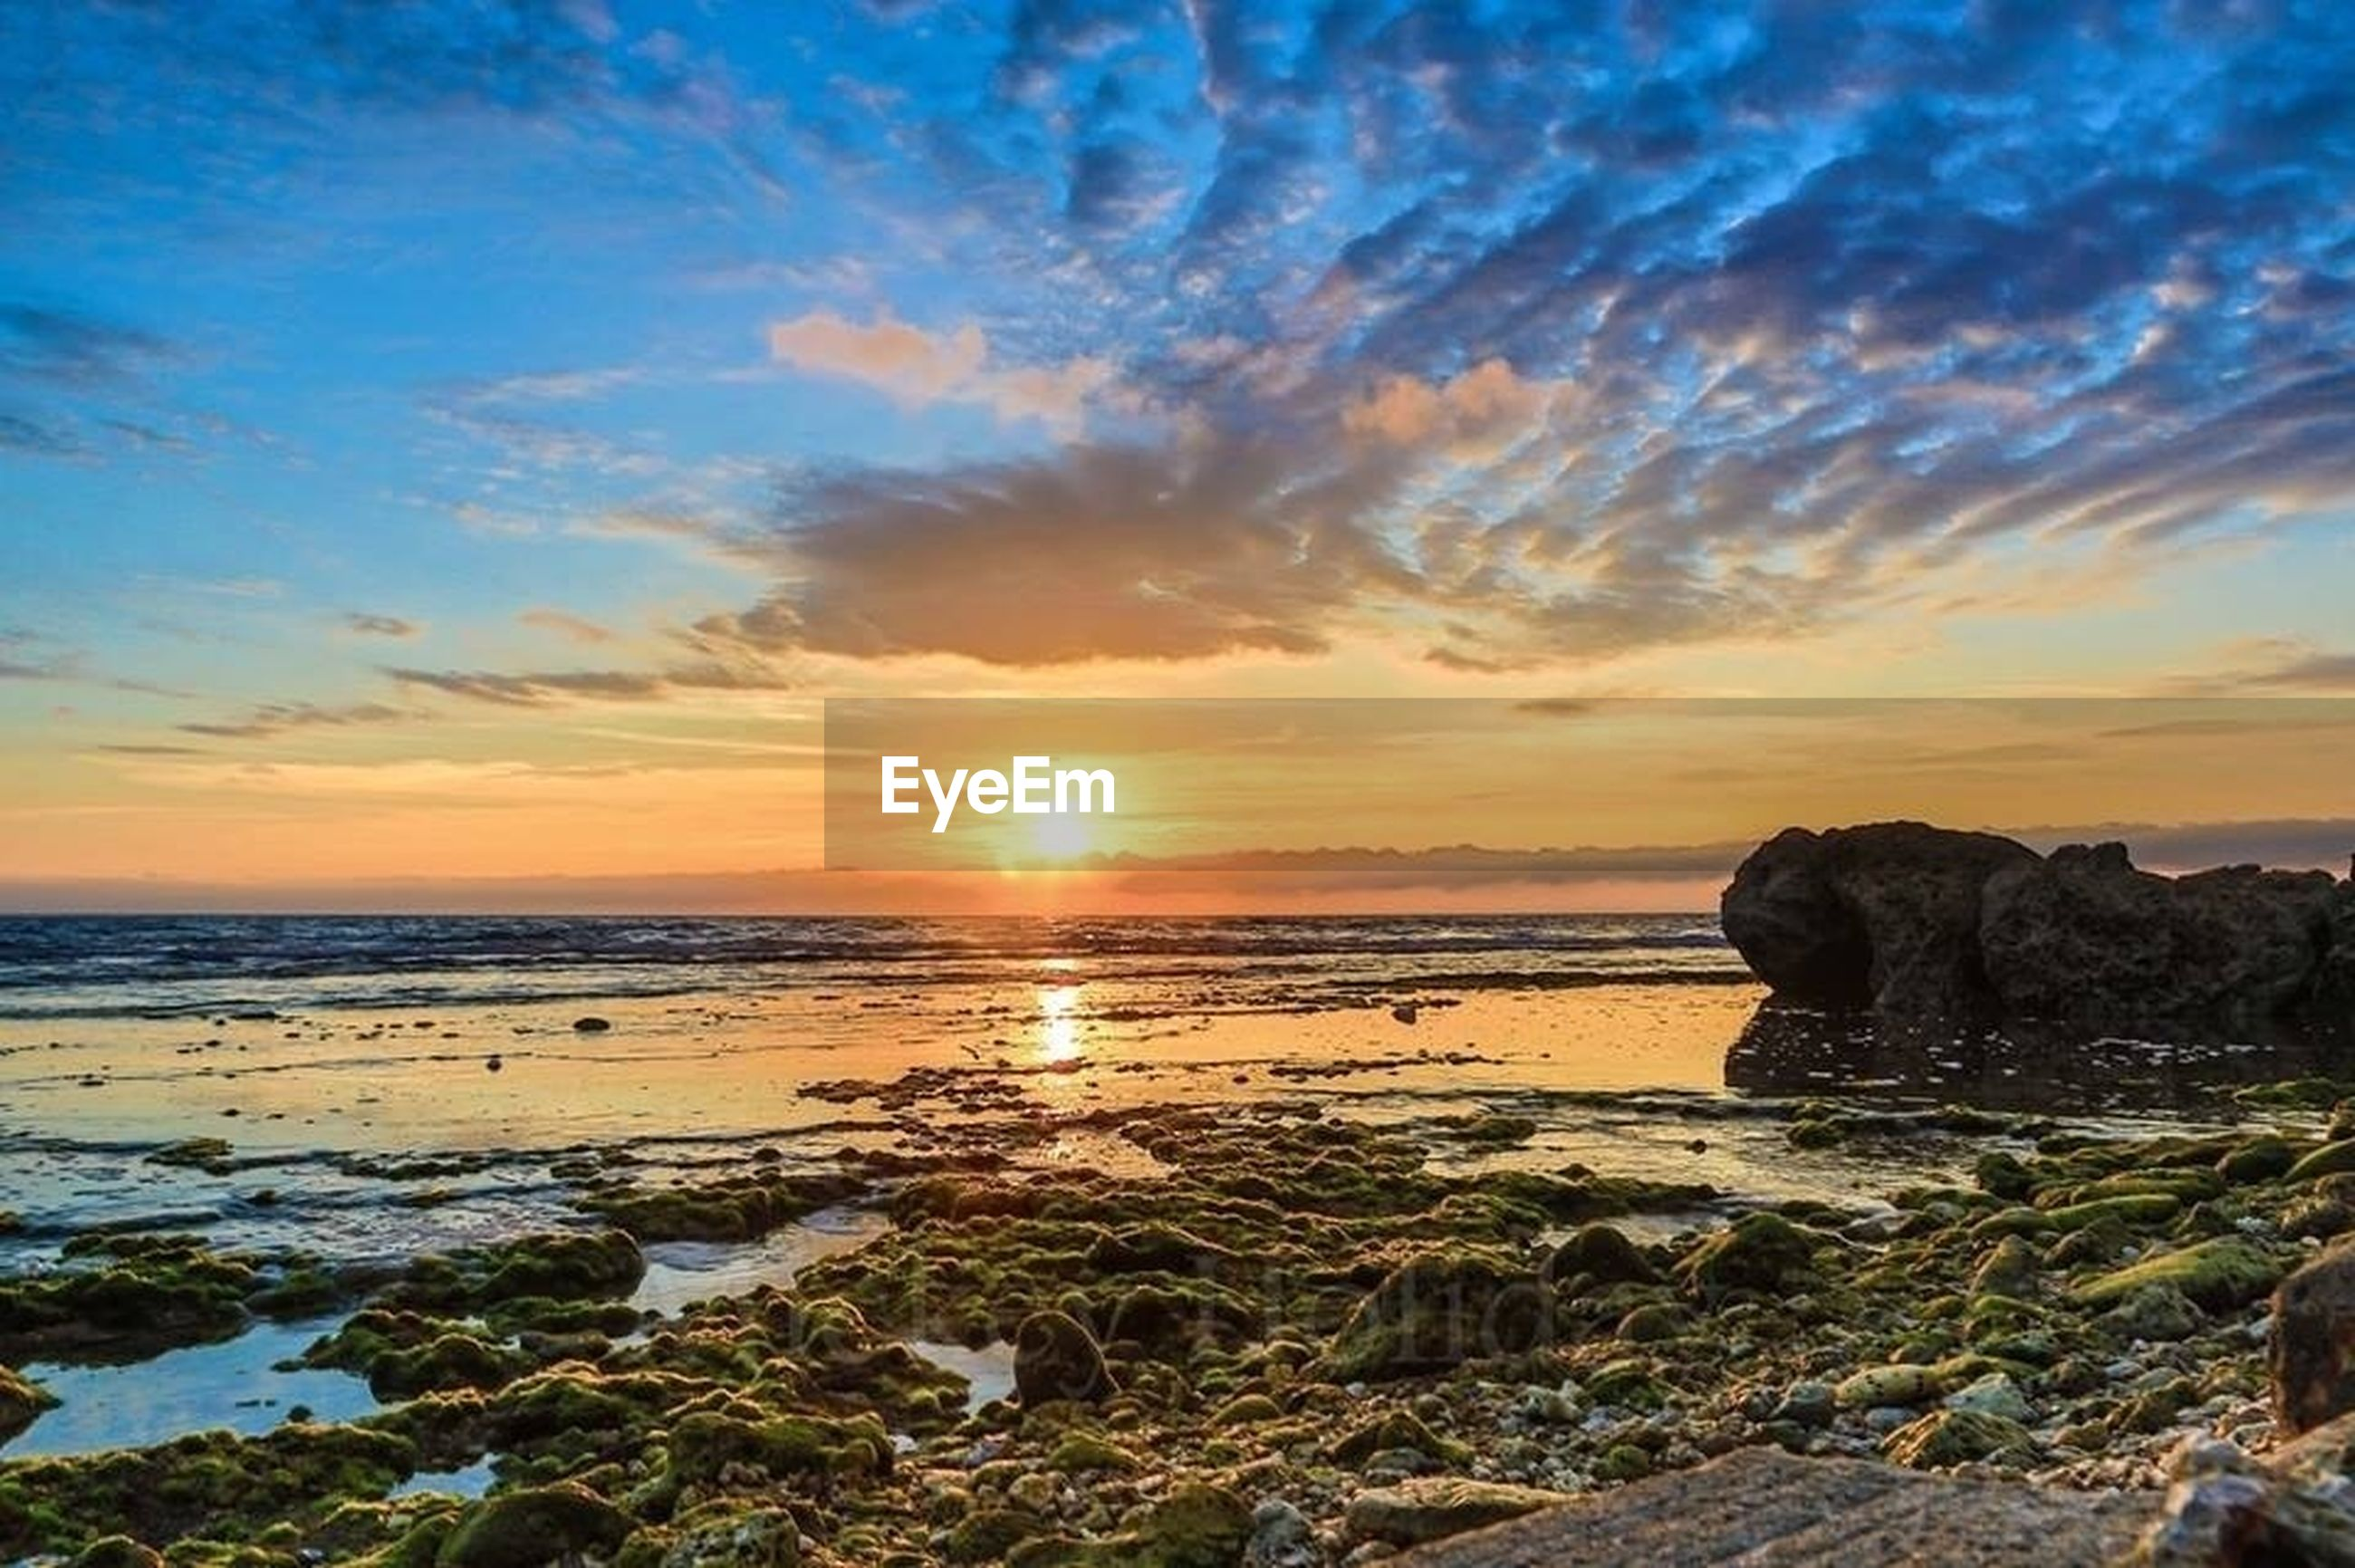 sunset, sea, scenics, water, tranquil scene, sky, beauty in nature, tranquility, beach, horizon over water, shore, sun, nature, cloud - sky, rock - object, idyllic, orange color, cloud, sunlight, non-urban scene